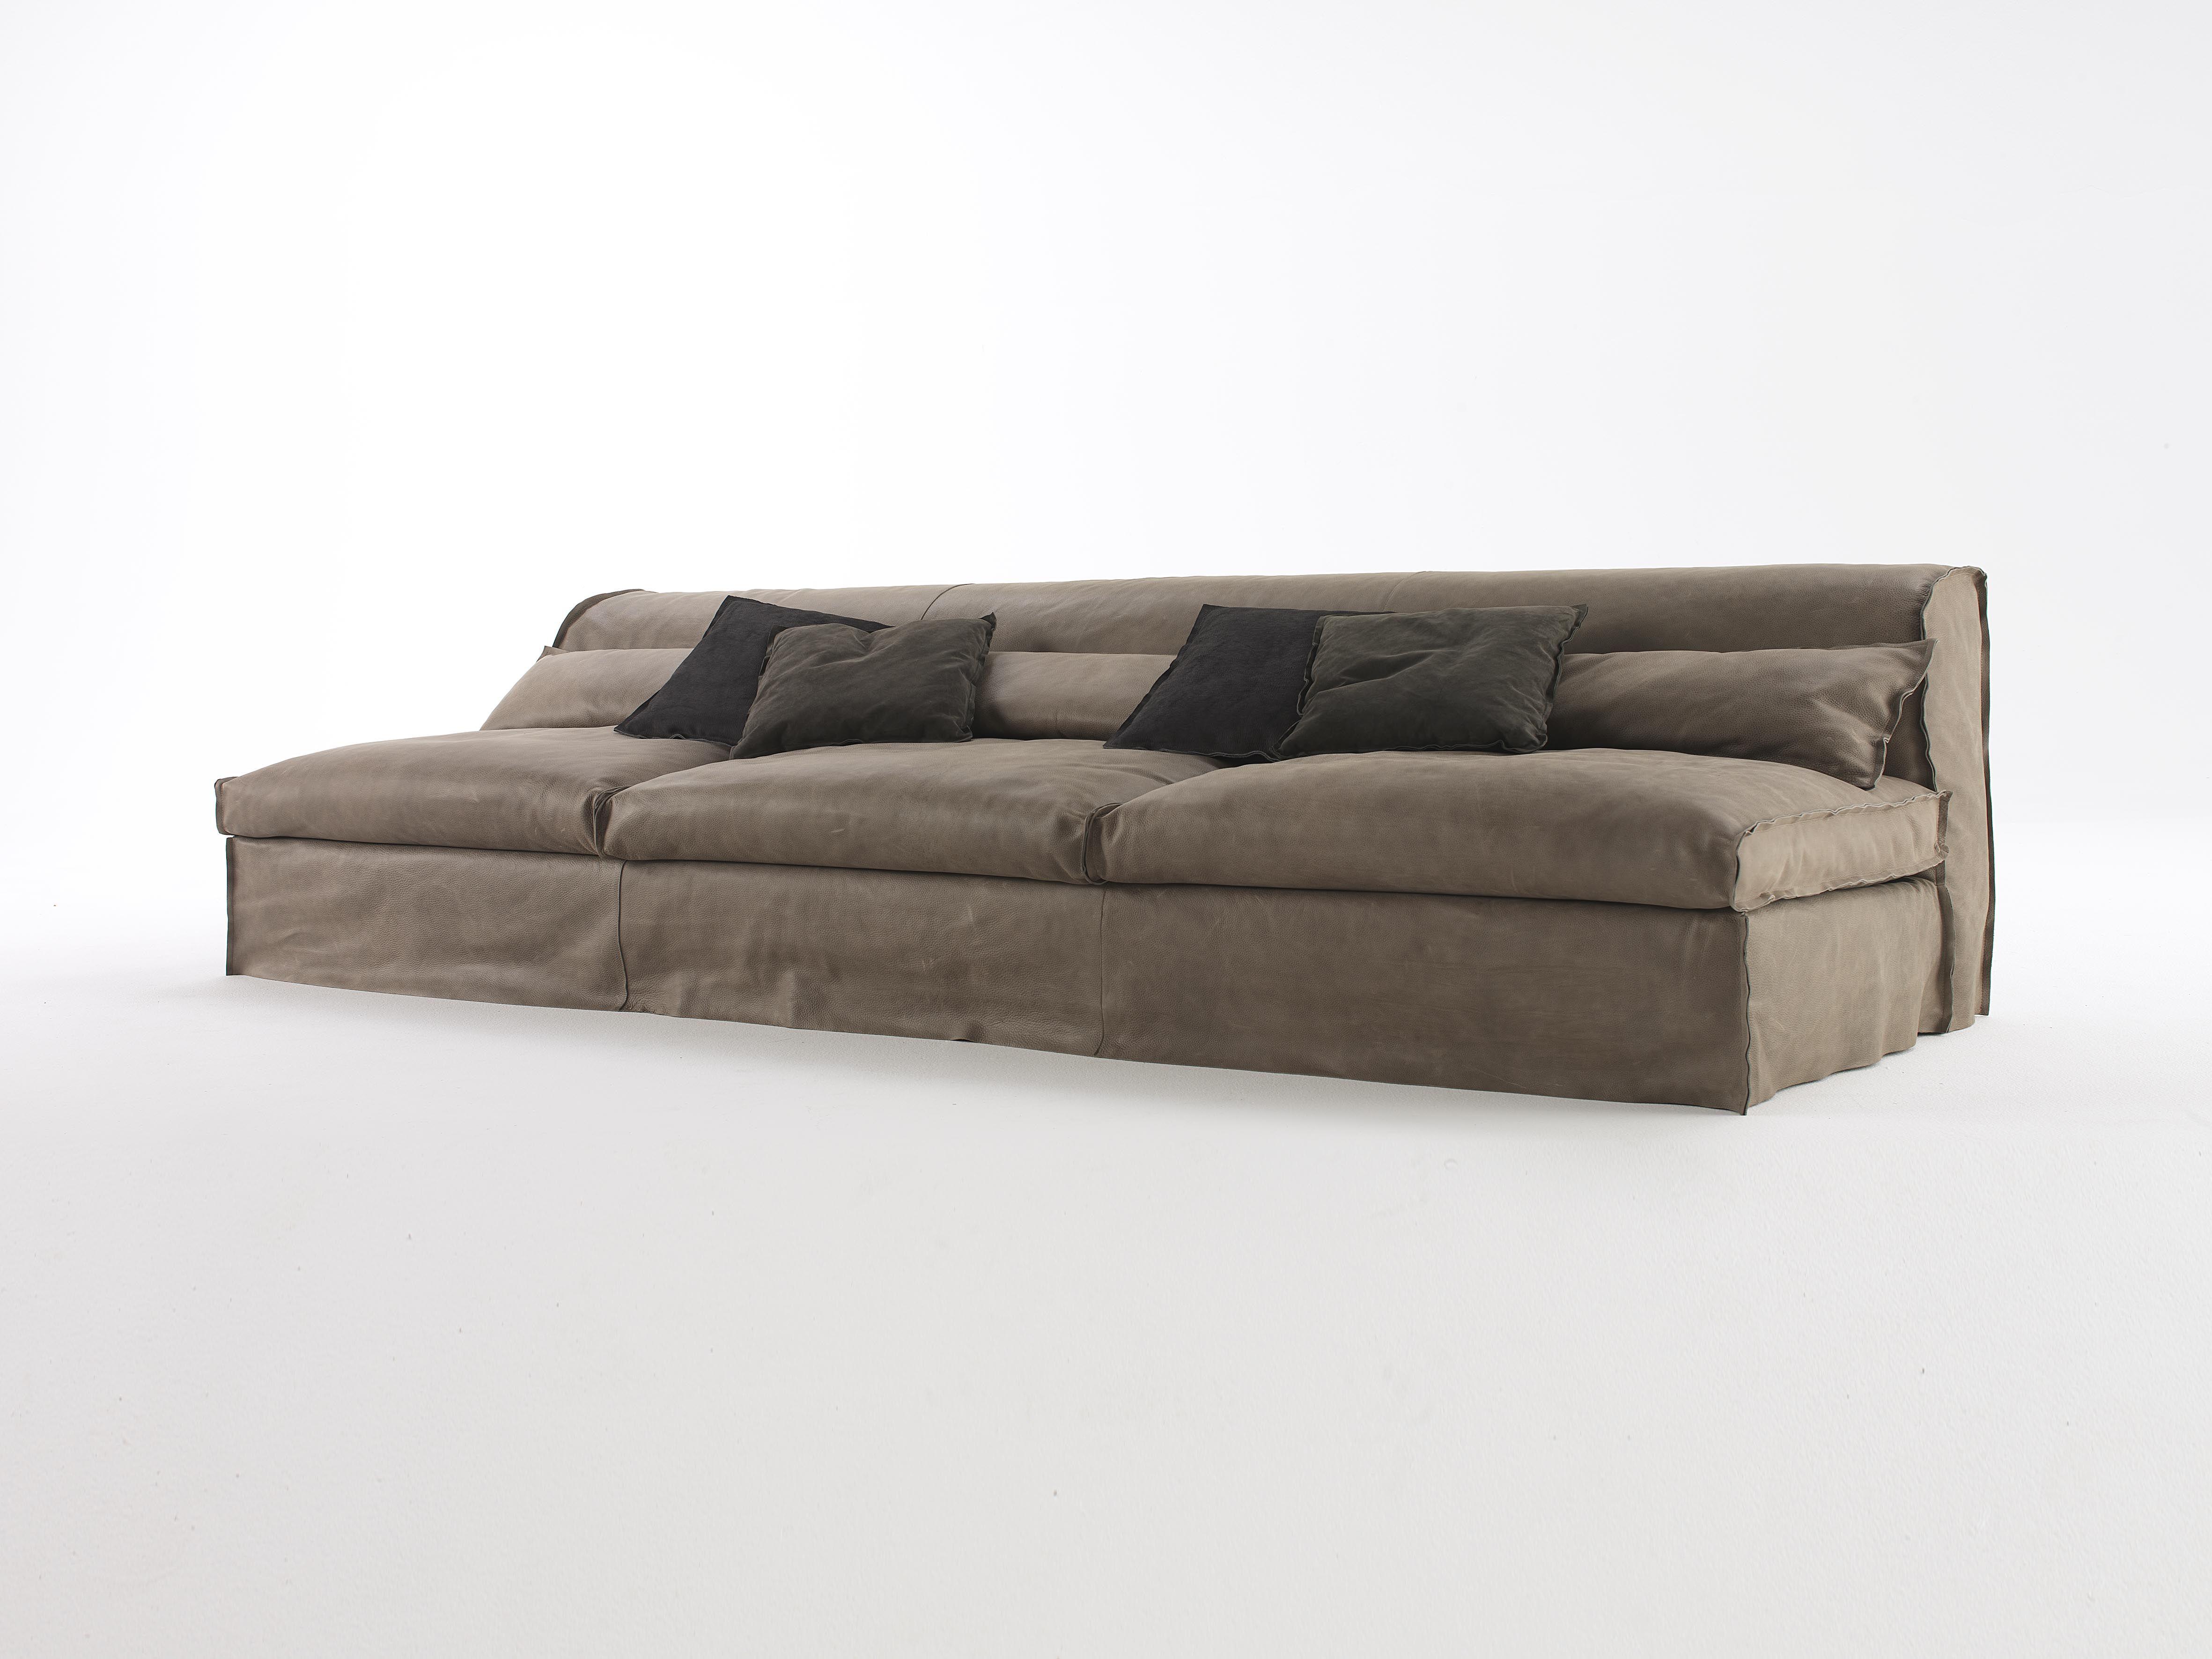 Baxter housse mono designer paola navone sofas for Baxter paola navone